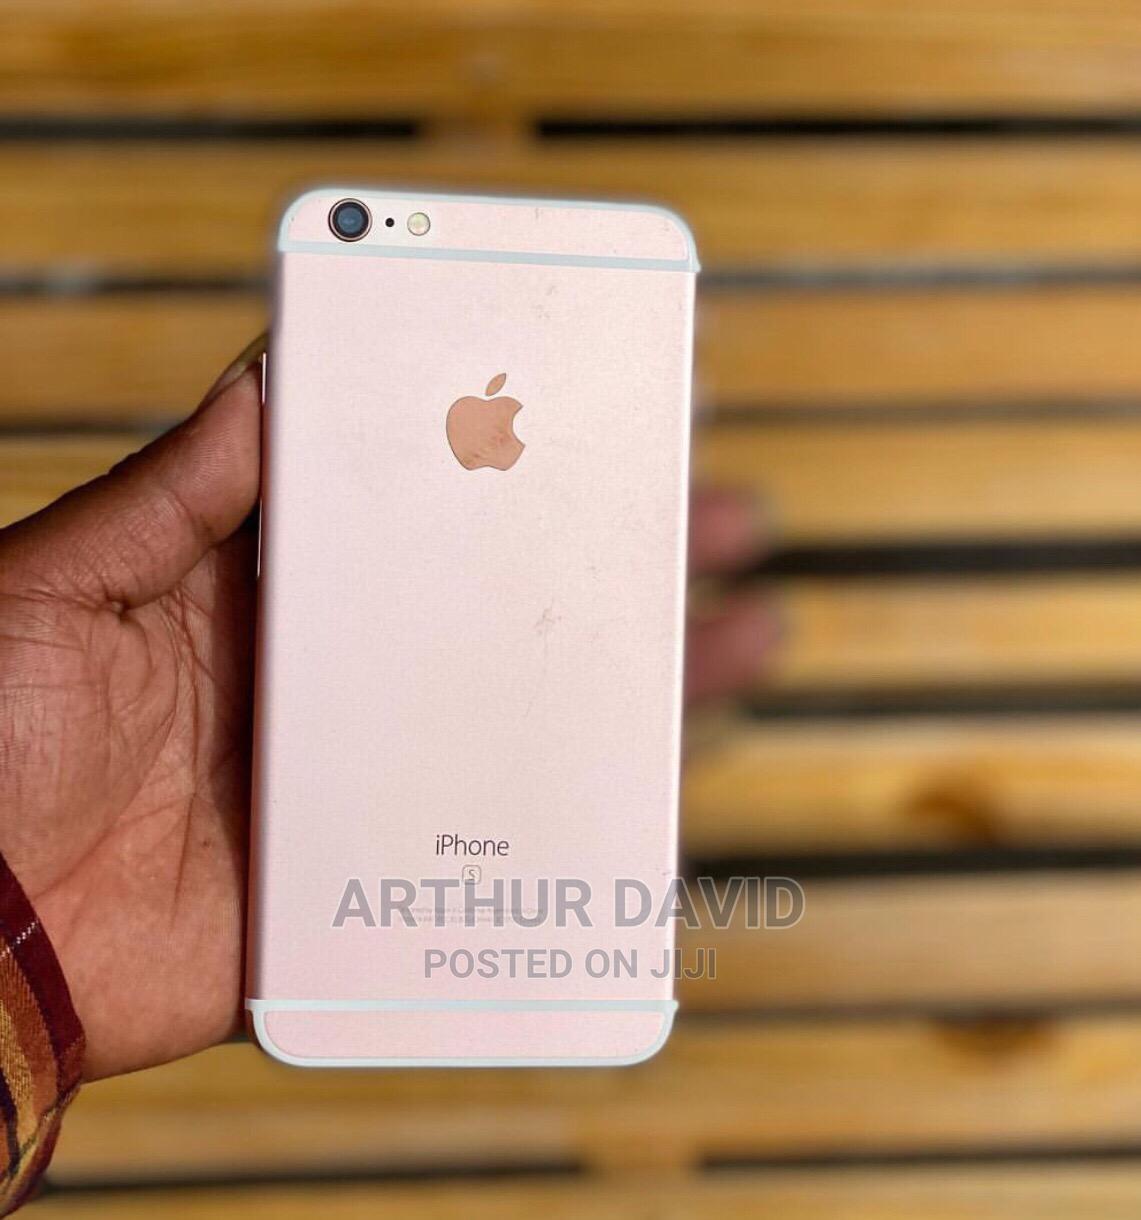 Apple iPhone 6 Plus 16 GB Gold   Mobile Phones for sale in Iringa Municipal, Iringa Region, Tanzania